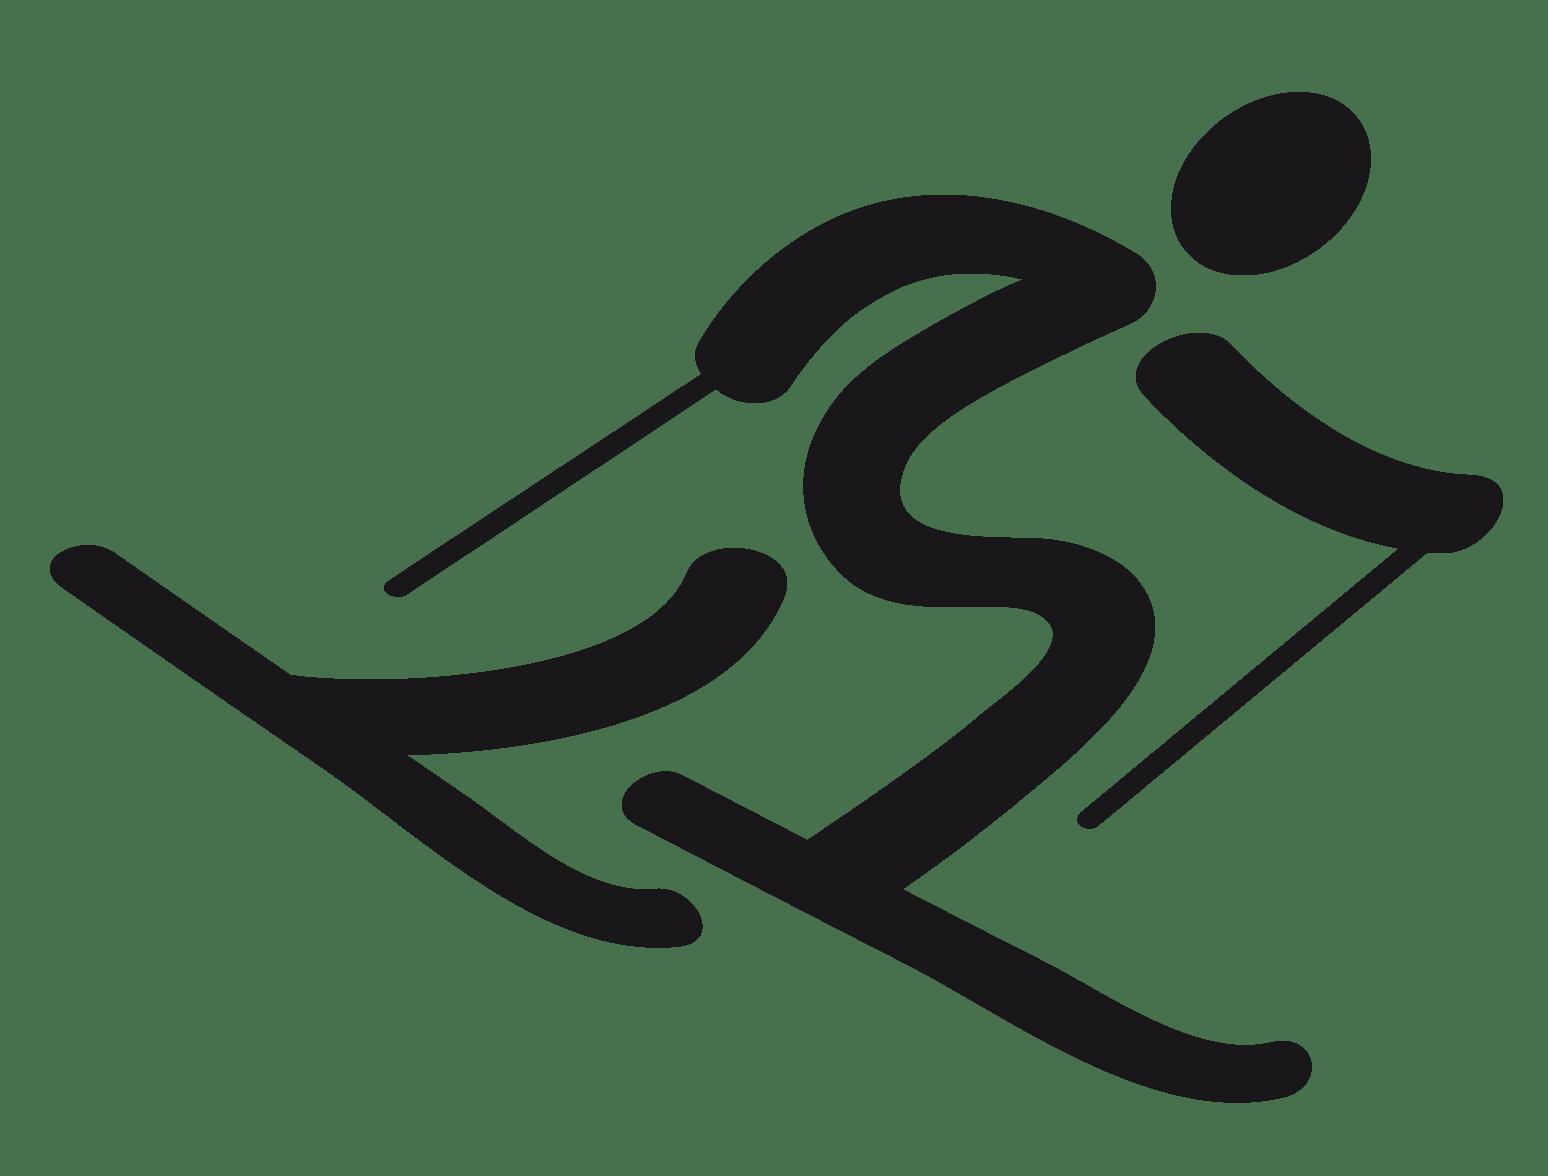 17 Alpine Olympic Icon Images